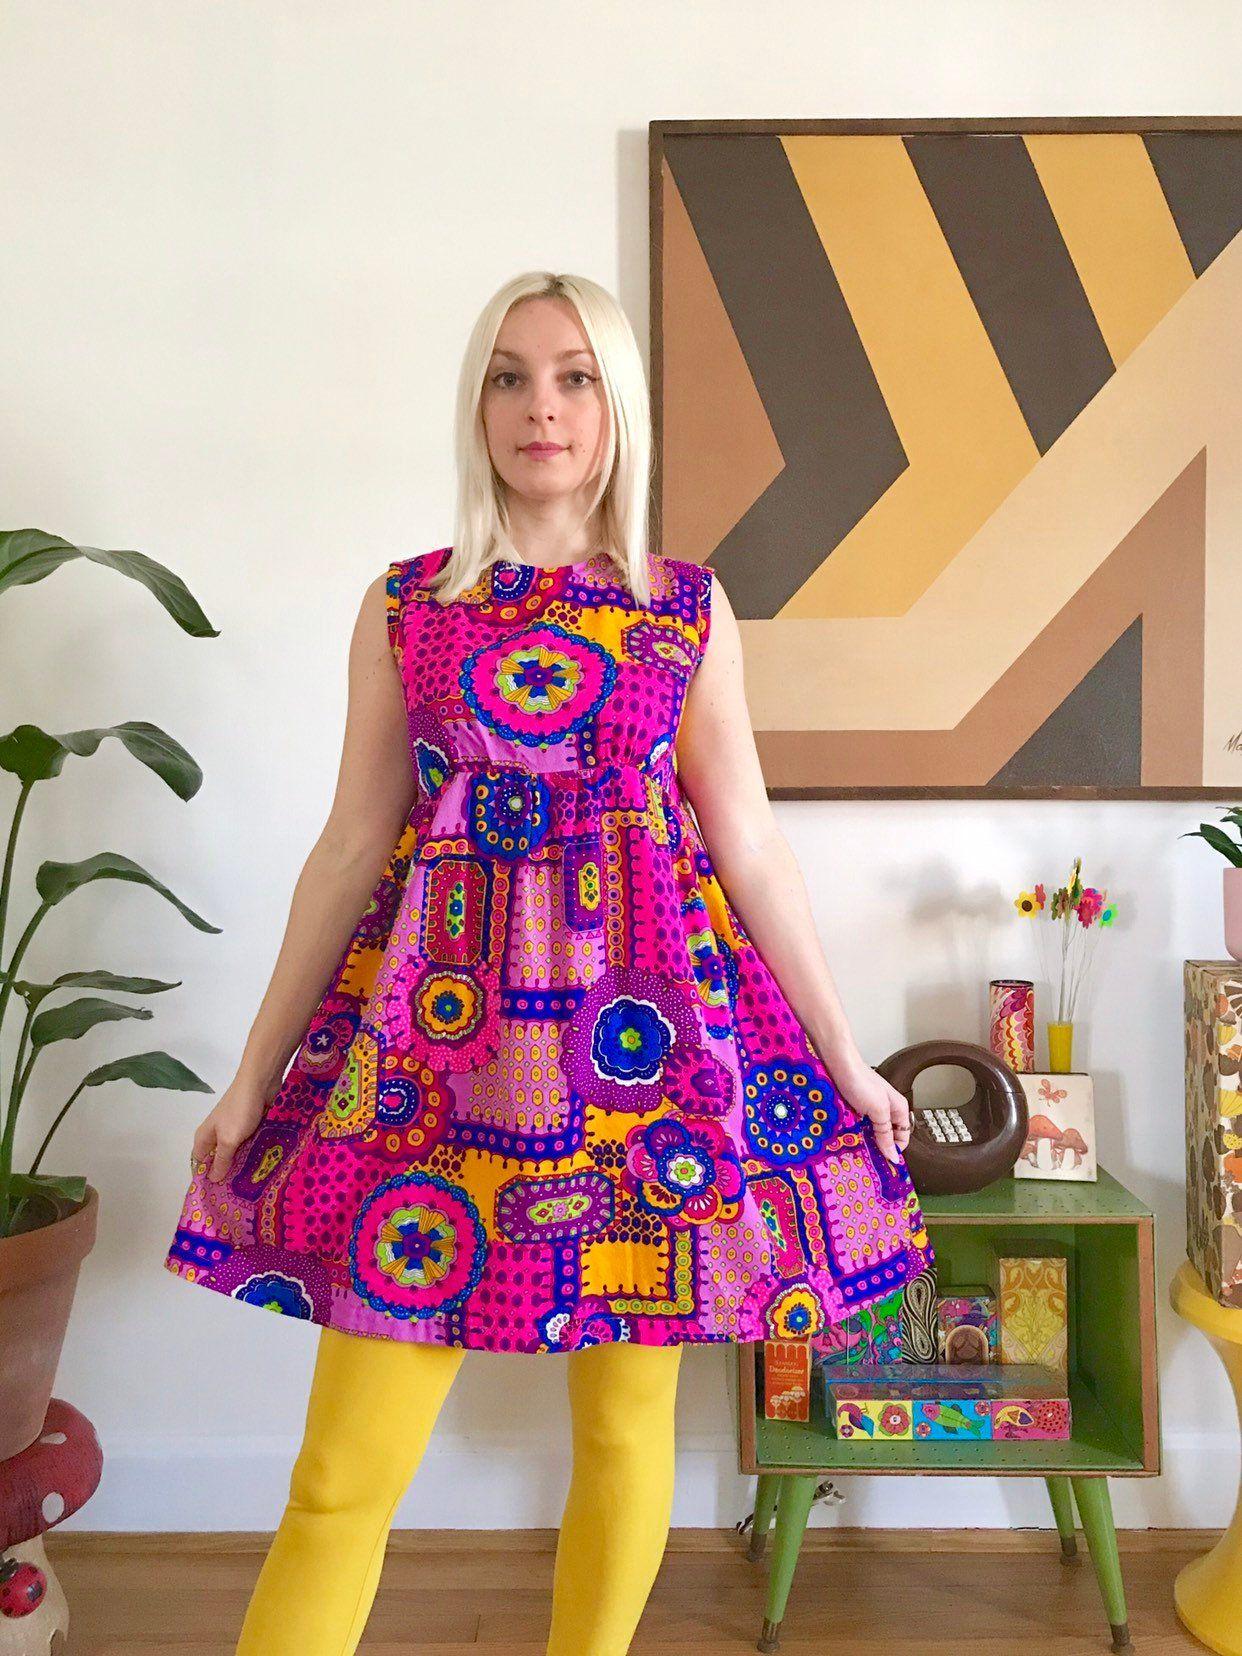 459c98f69c8a0 Vintage 60s 70s psychedelic babydoll mini dress M day glo kaleidoscope  print empire waist 1970s sleeveless micro mini dress homemade